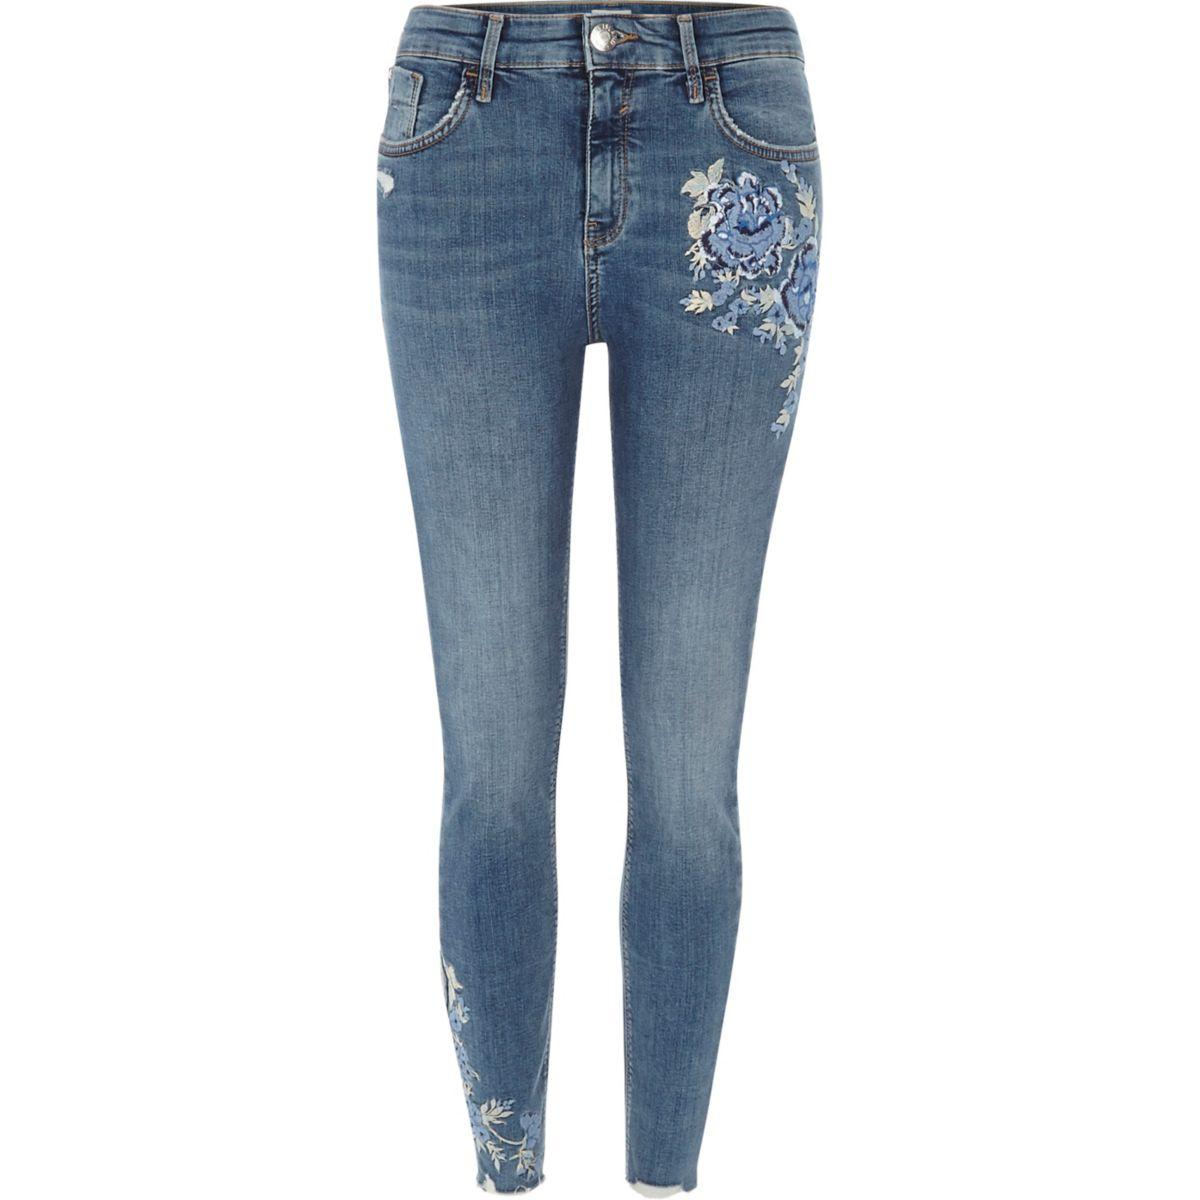 Blue Amelie embroidered super skinny jeans